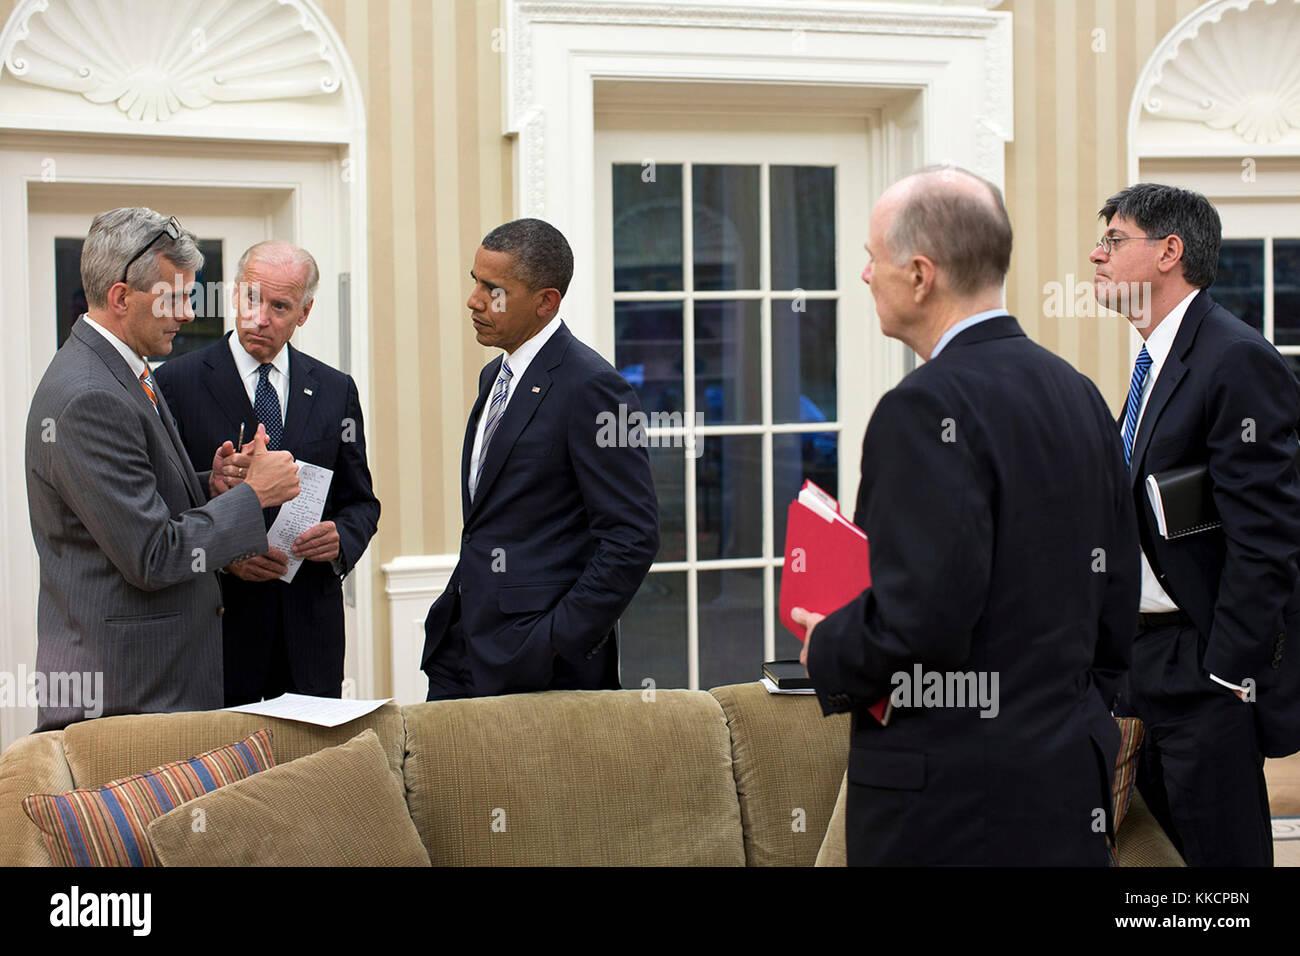 Sept. 11, 2012 'Denis McDonough, Deputy National Security Advisor, left, updates the President and Vice President - Stock Image